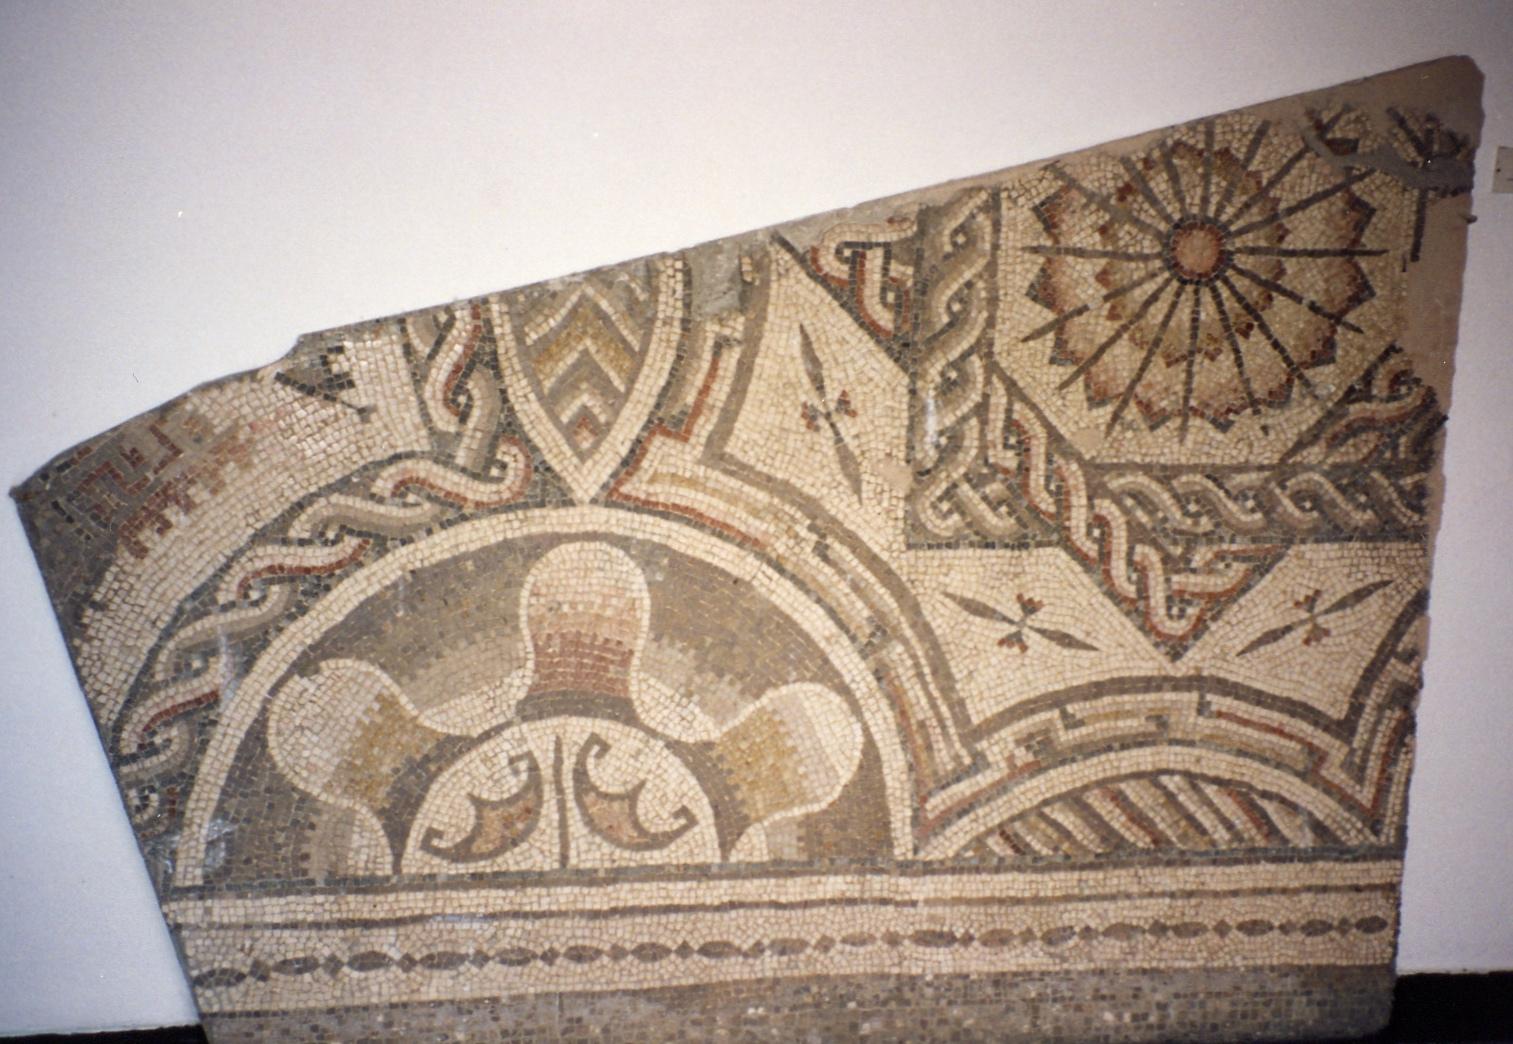 Wonderful pyrite from Navajún Spain